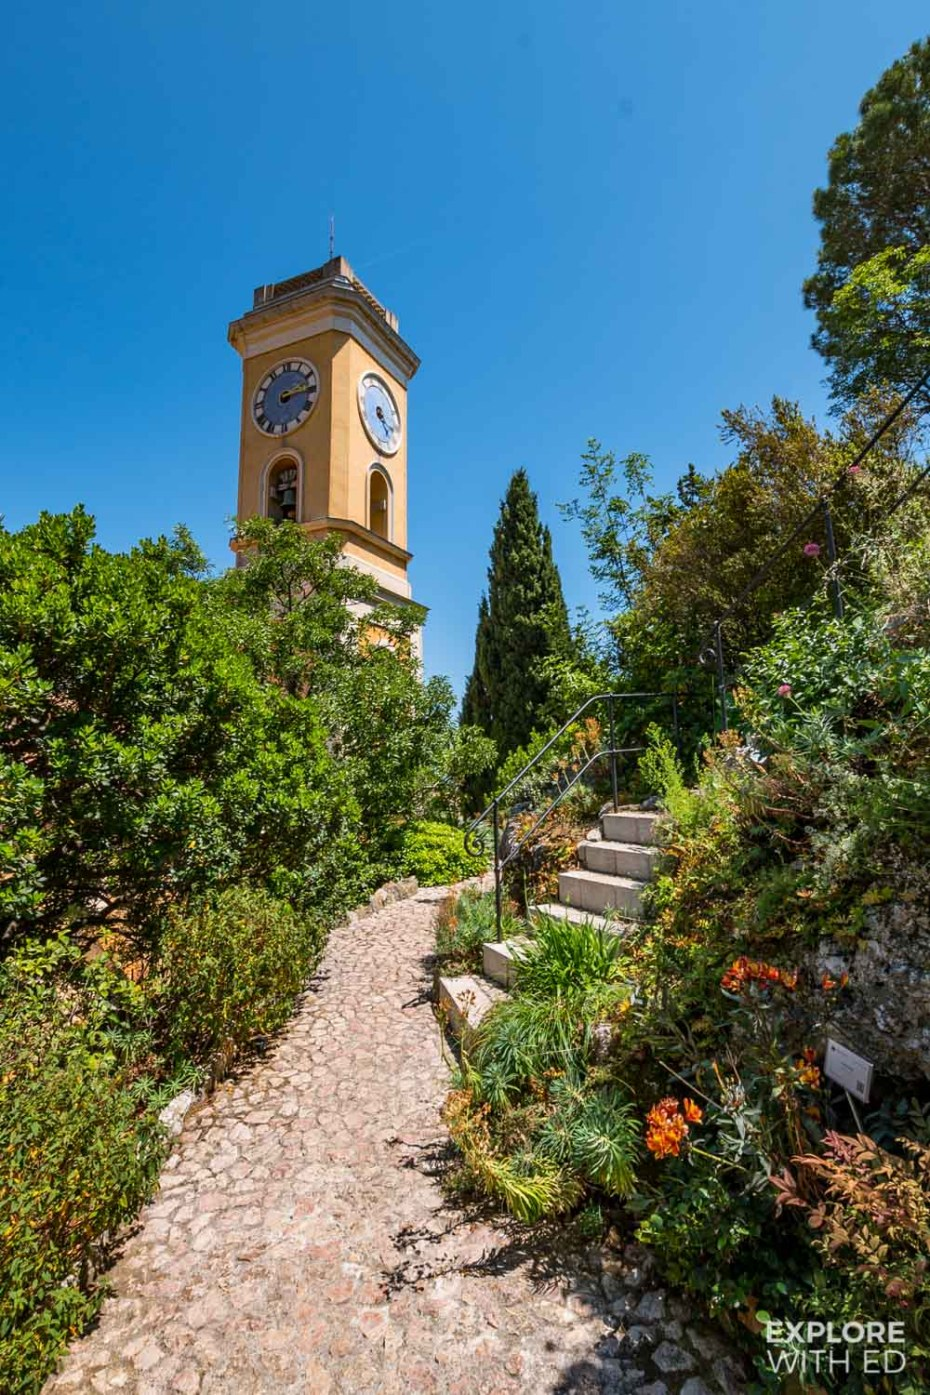 Eze church bell tower and Mediterranean flower garden